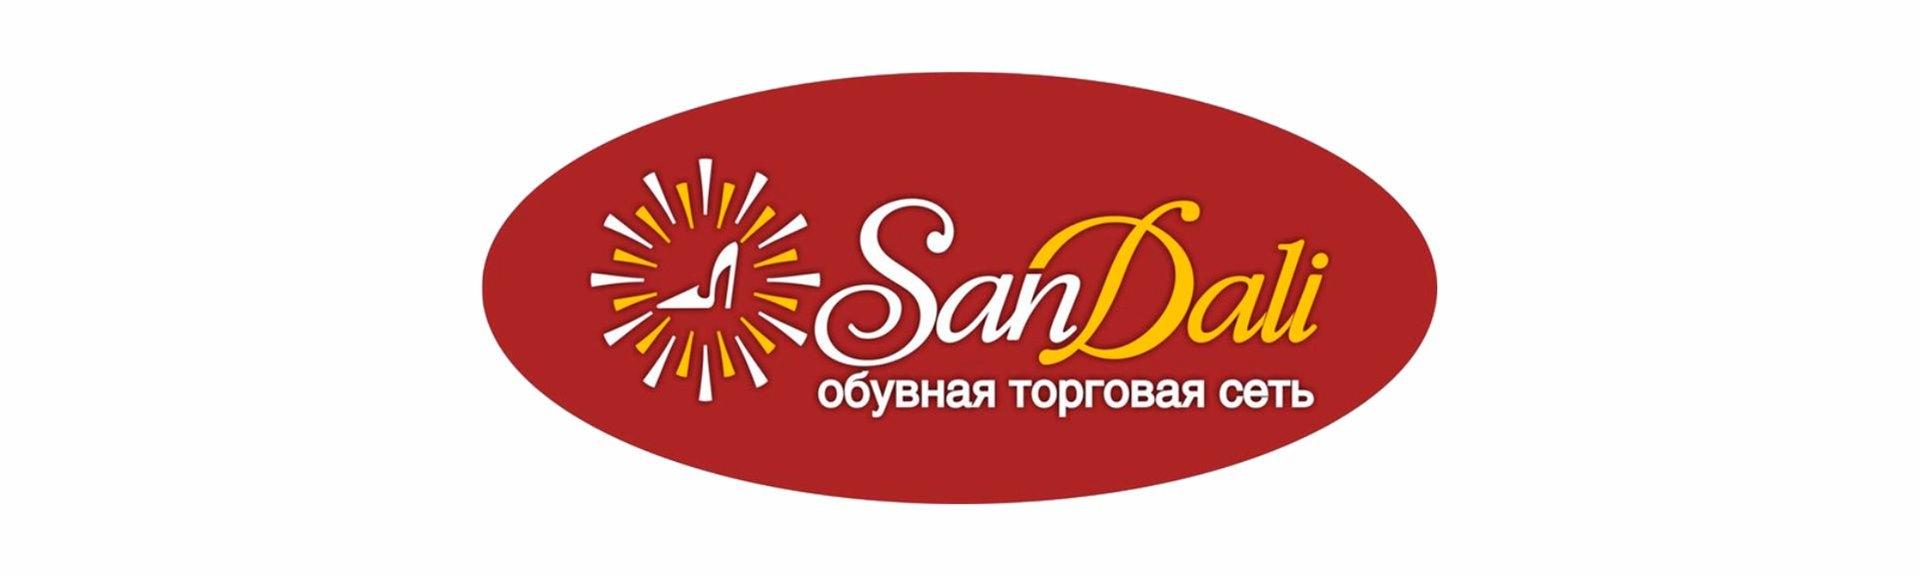 https://www.almazcom.ru/pub/img/QA/346/Sandali_partnerskaya.jpg